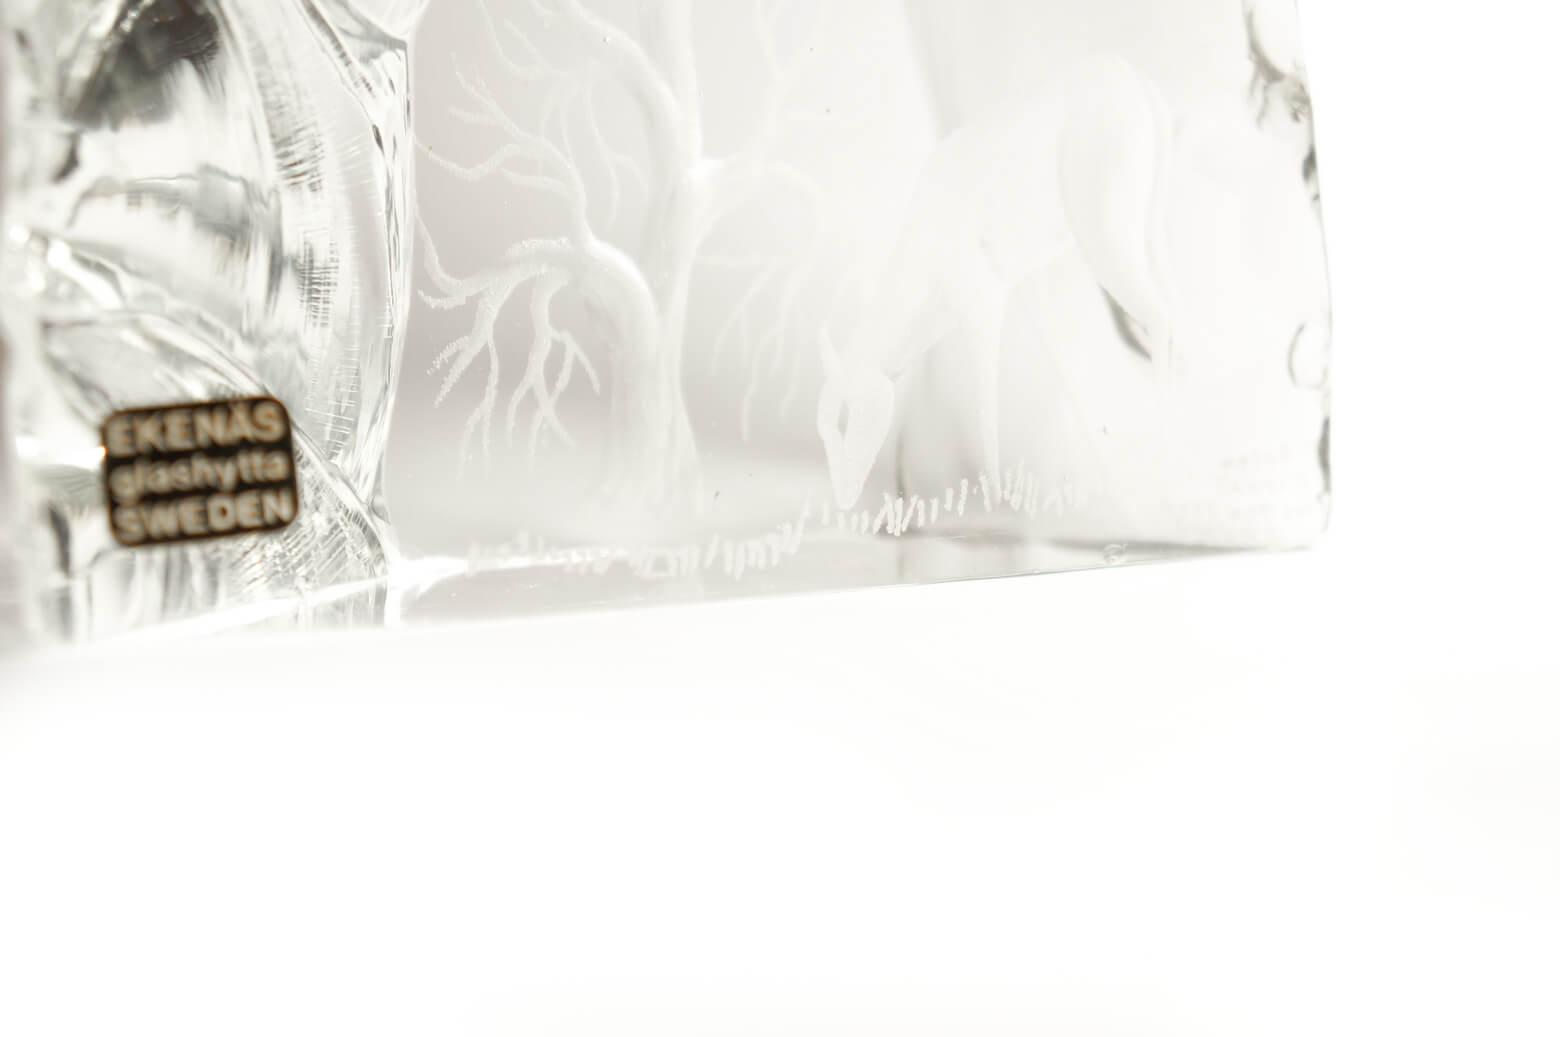 Ekenas Glashytta Glass Object Deer Tony Racov/ガラス オブジェ 鹿 スウェーデン 北欧雑貨 ヴィンテージ